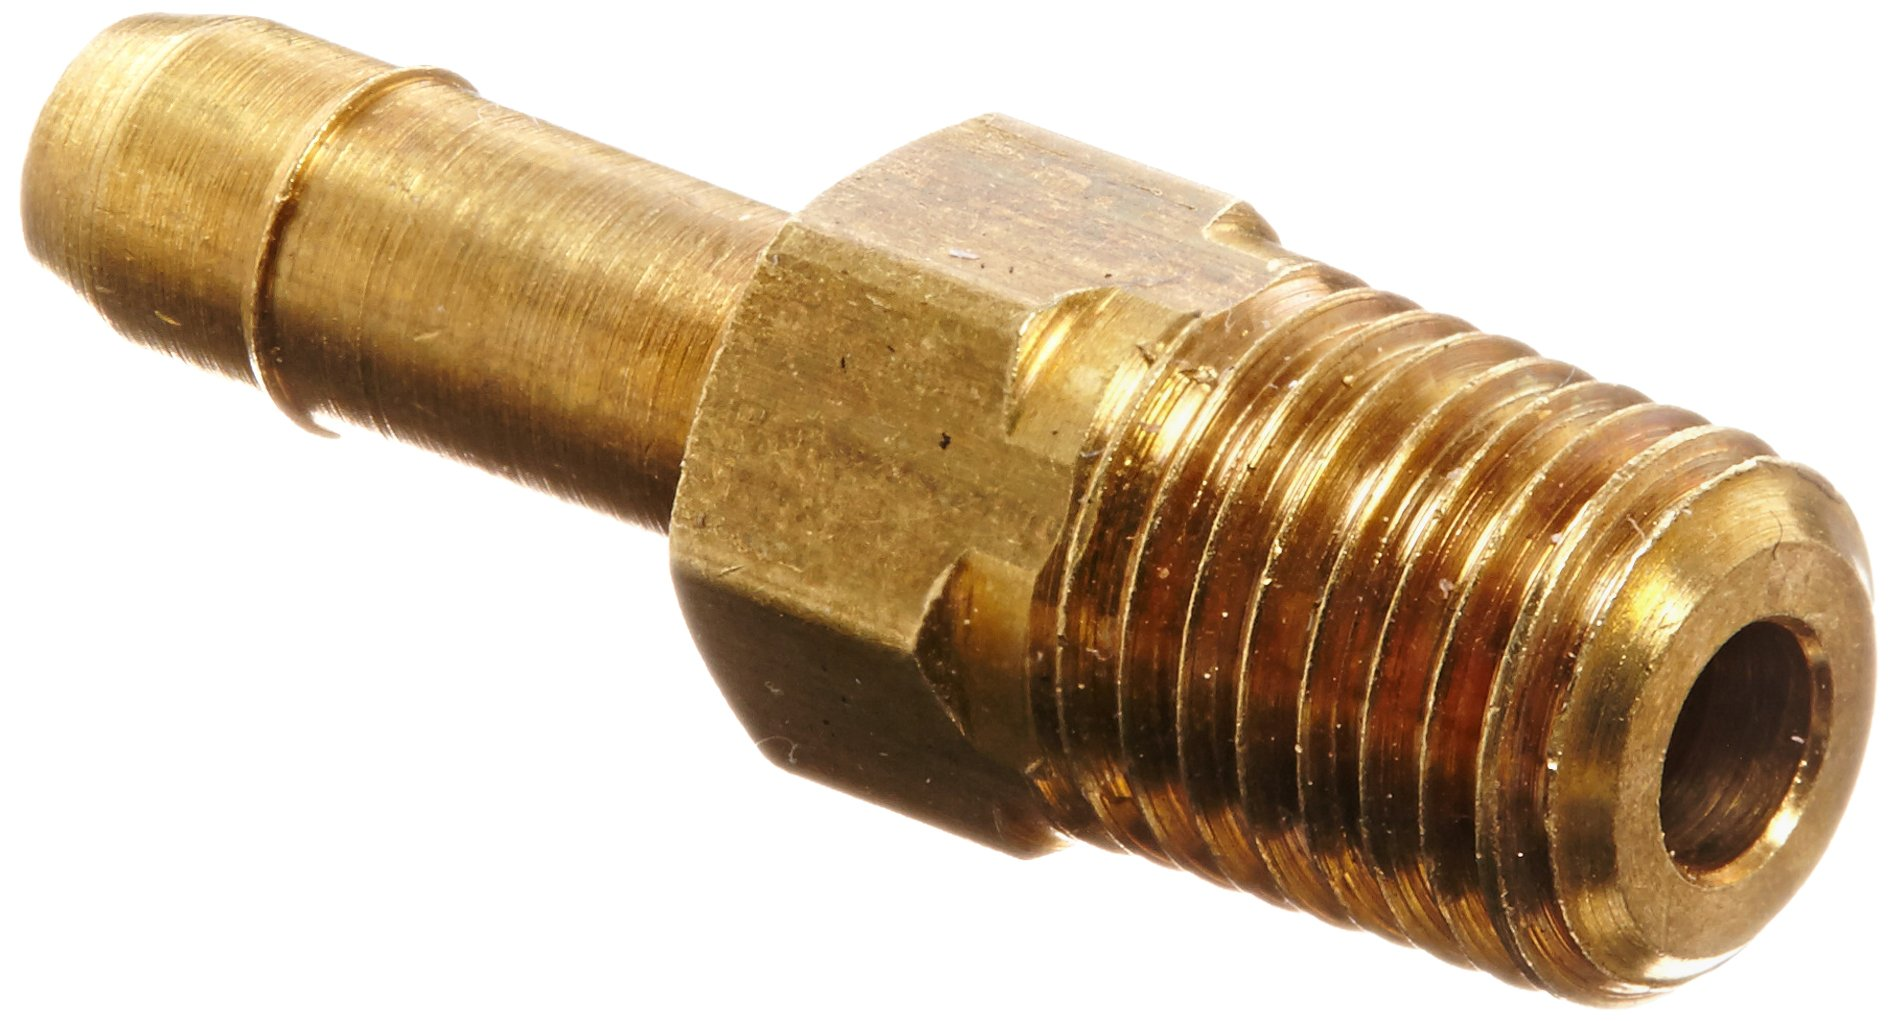 Eaton Weatherhead 1068X4X1 Brass CA360 Mini-Barb Brass Fitting, Adapter, 1/4'' Tube OD x 1/16'' NPT Male (Pack of 5)